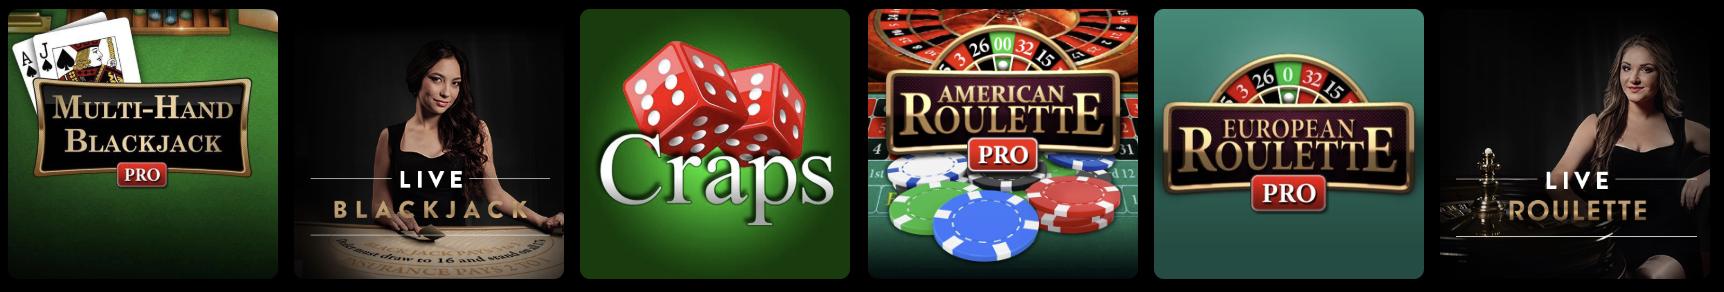 playmgm casino online nj blackjack and roulette